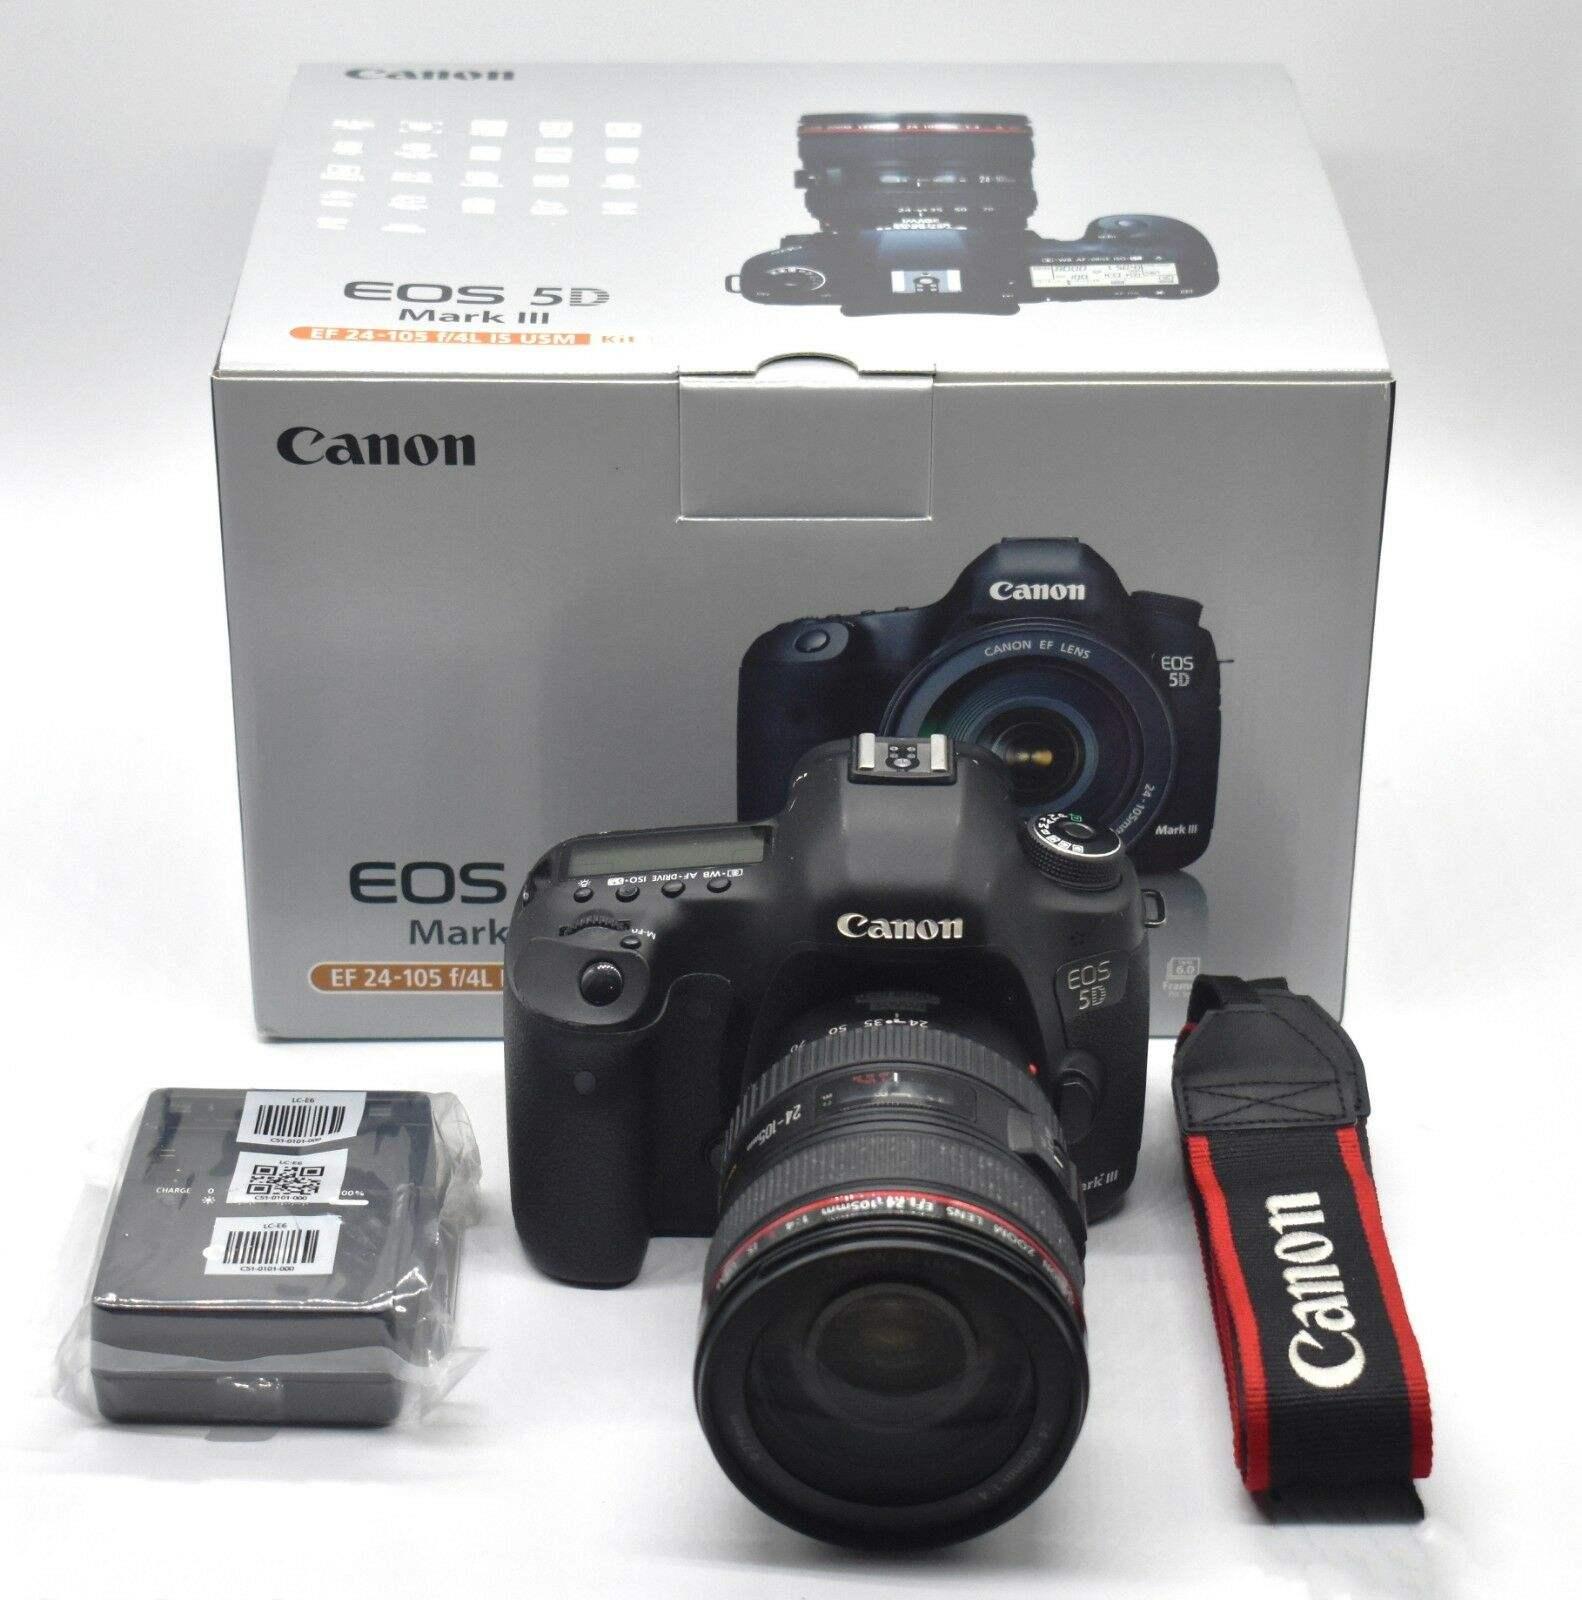 Canon EOS 5D Mark III 22.3MP Digital SLR Camera - Canon EOS 5D Mark IV Full Frame Digital SLR Camera